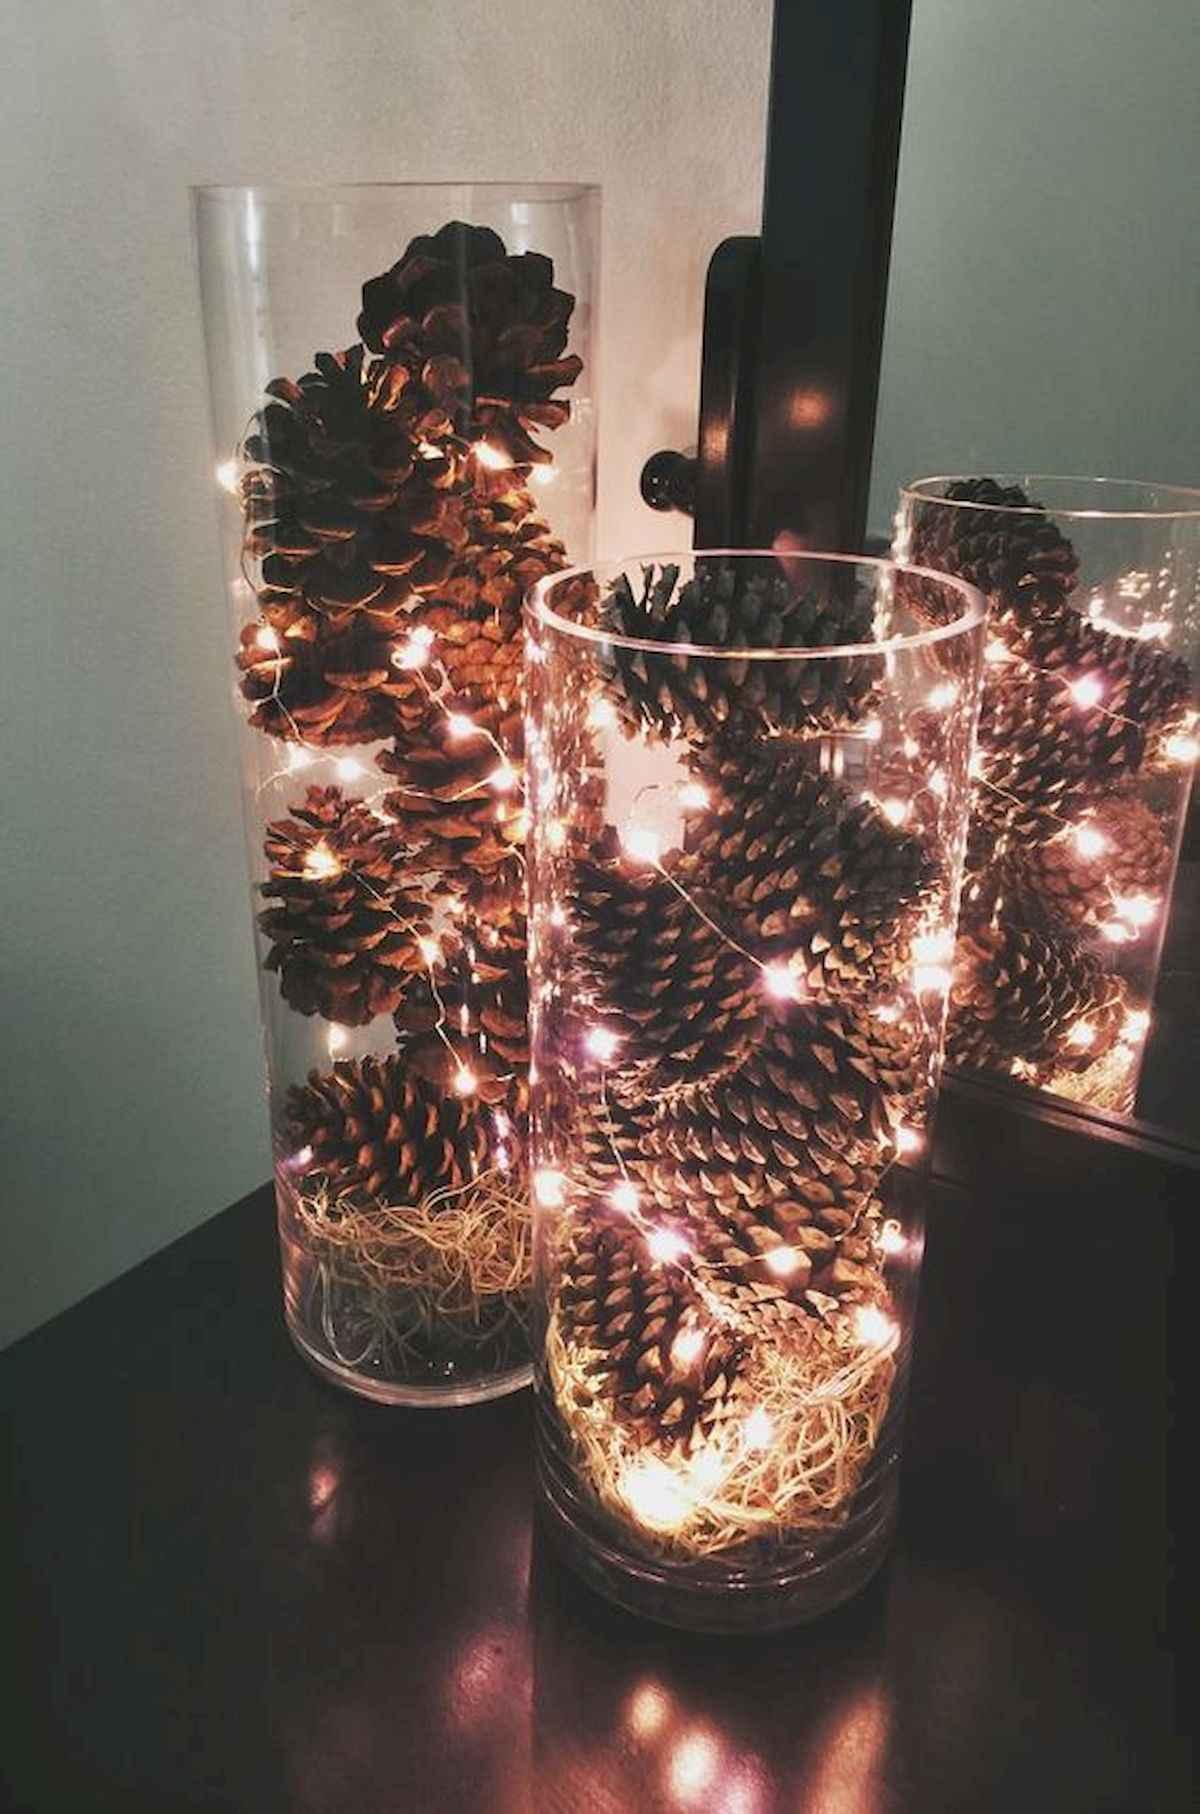 50 diy christmas decorations ideas (20)